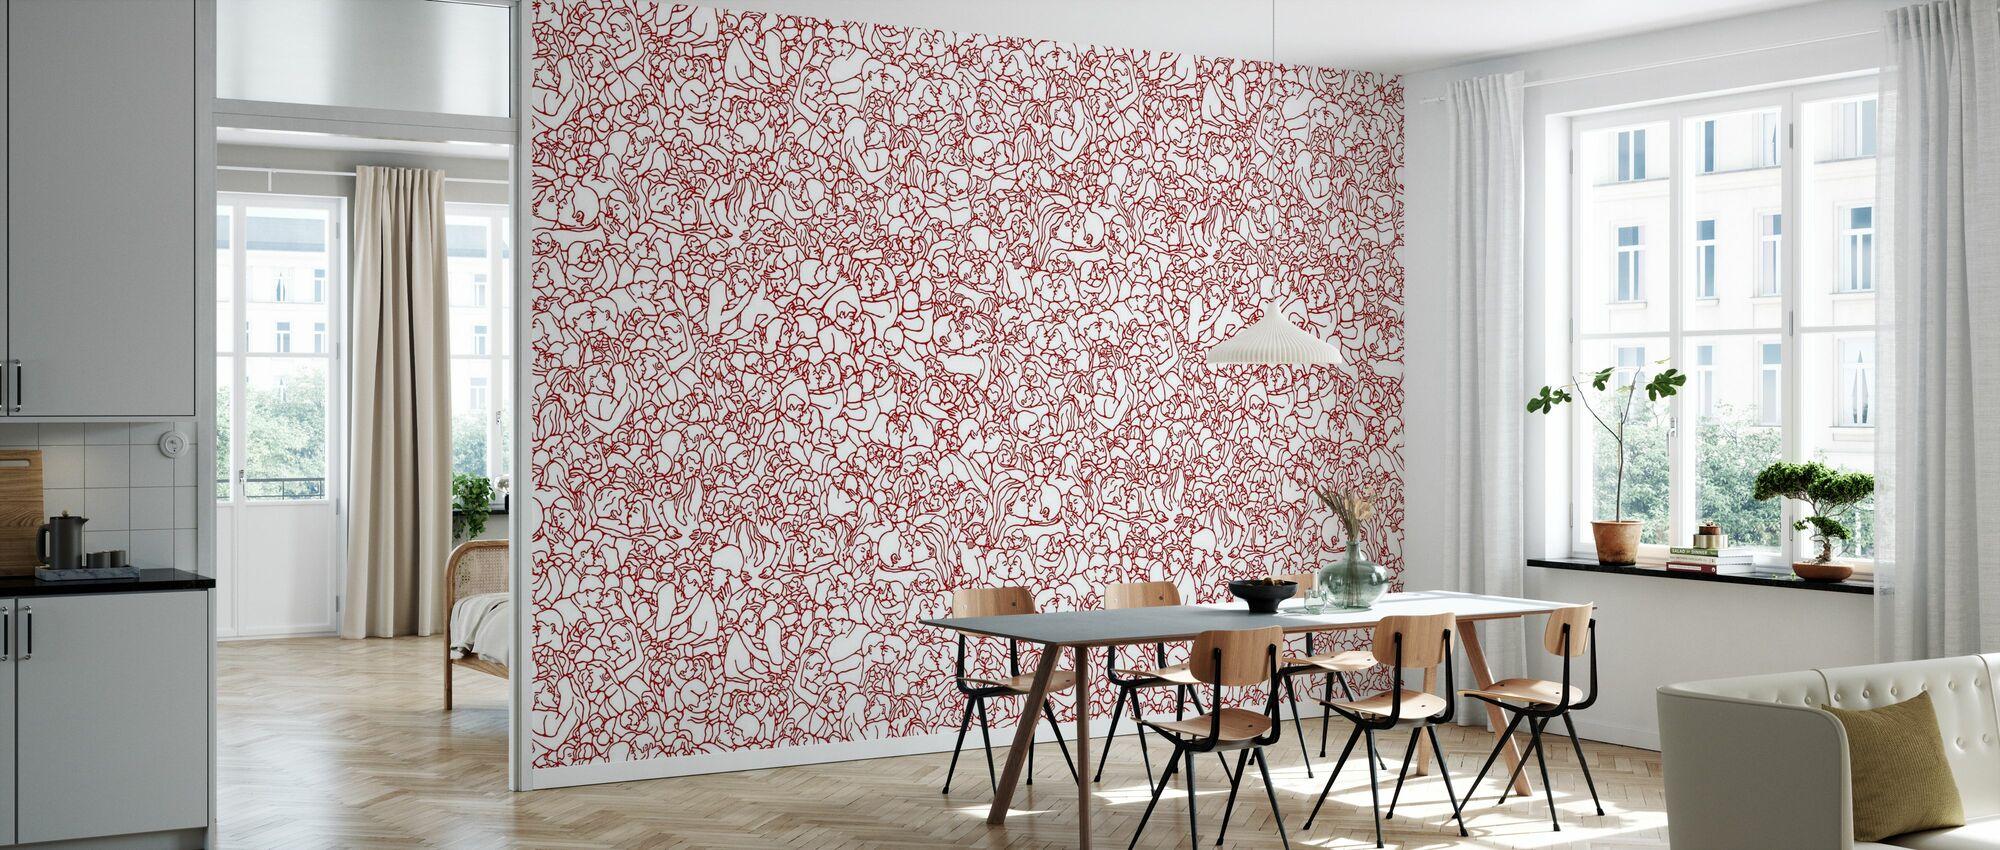 Kissing Pattern - Red - Wallpaper - Kitchen